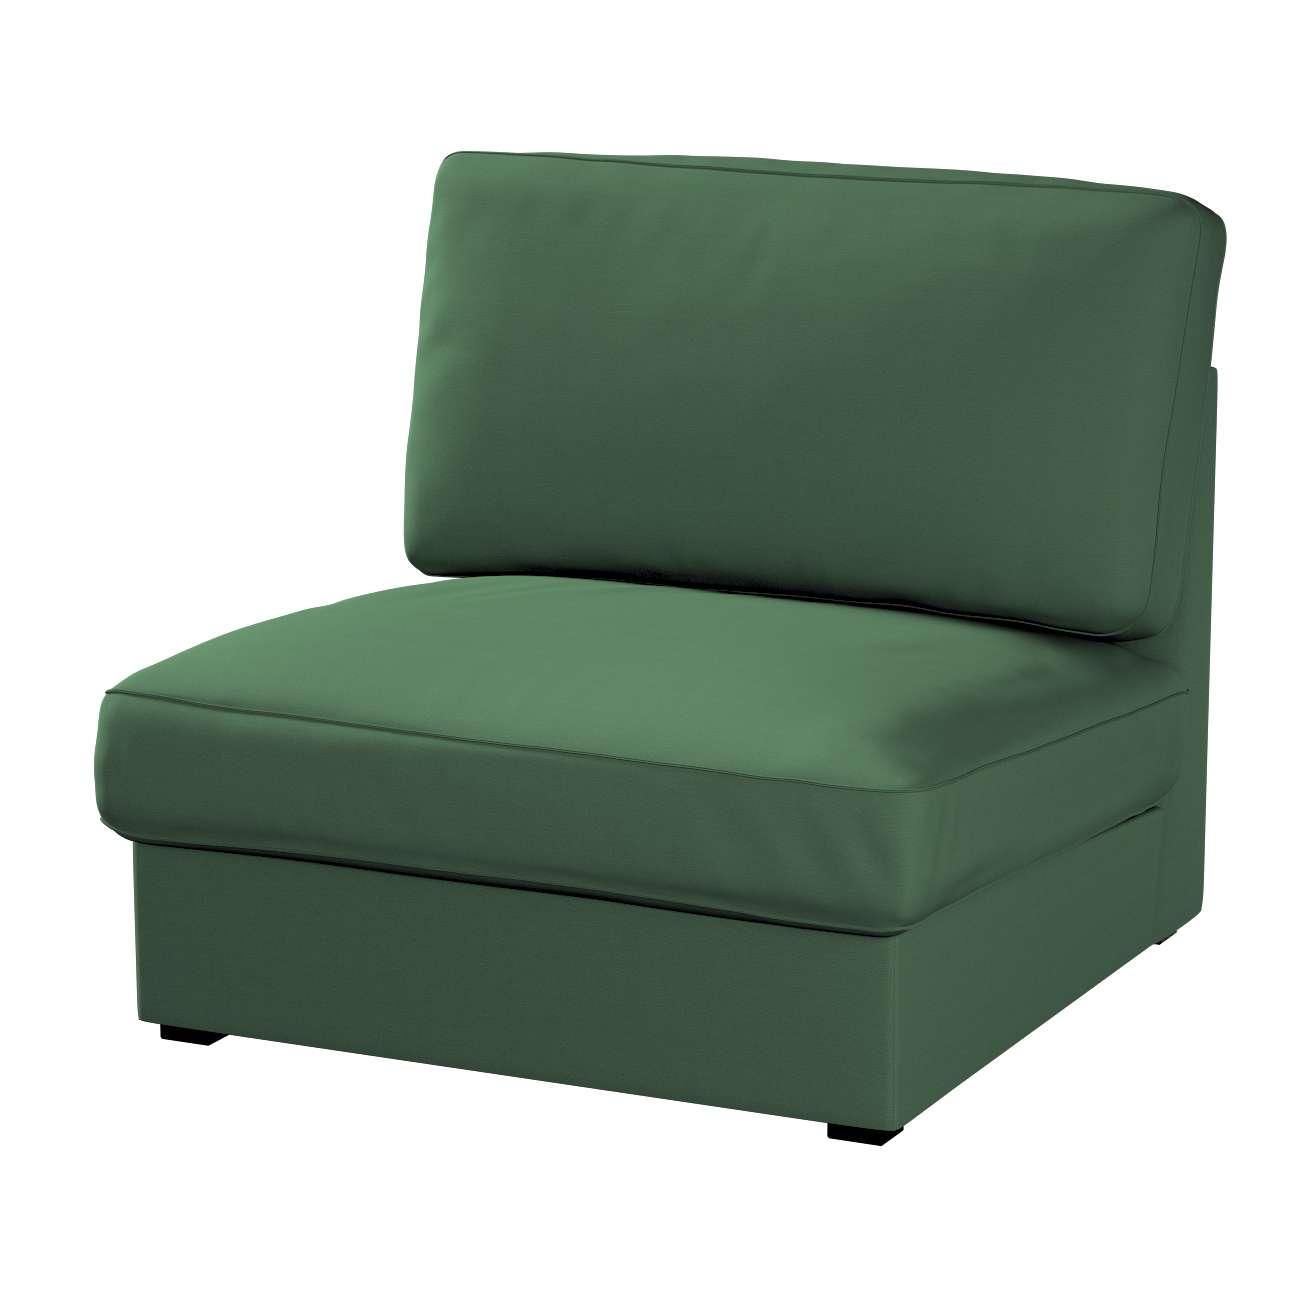 Pokrowiec na fotel Kivik Fotel Kivik w kolekcji Cotton Panama, tkanina: 702-06